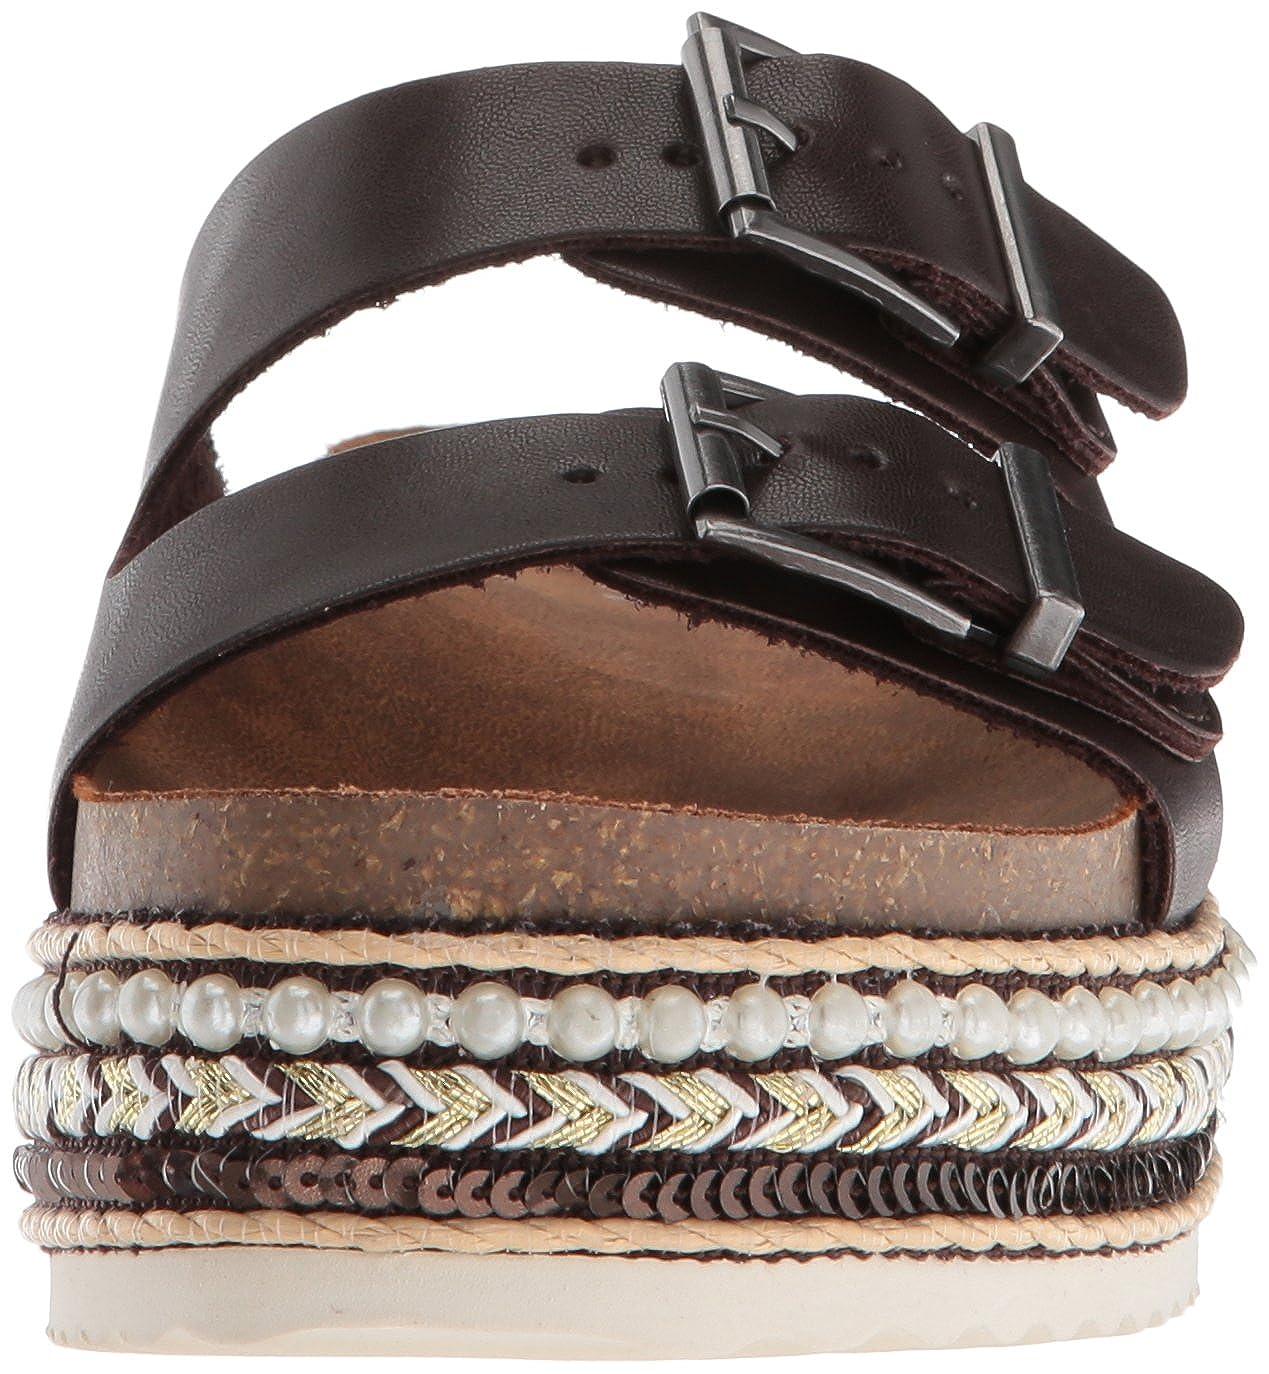 reputable site 282a0 c22c5 Nike Wmns Air Max 95 Grape Womens New Shoes Women White Court Purple  307960-109,